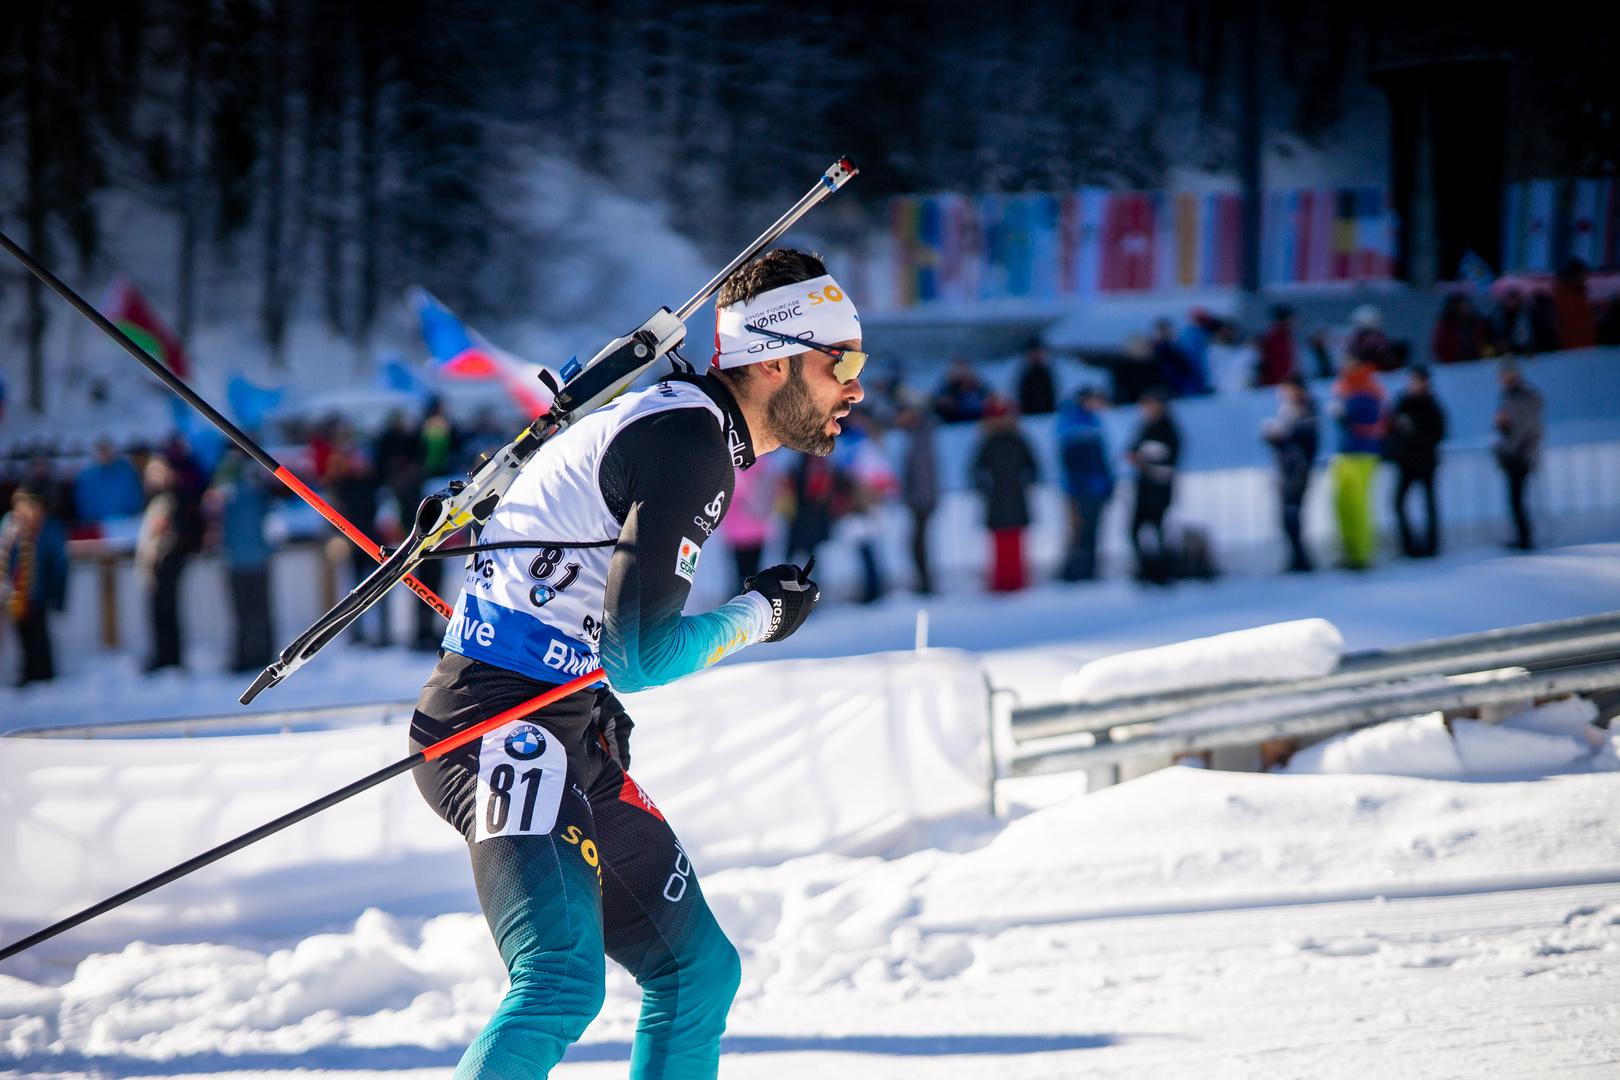 Biathlon Rupolding